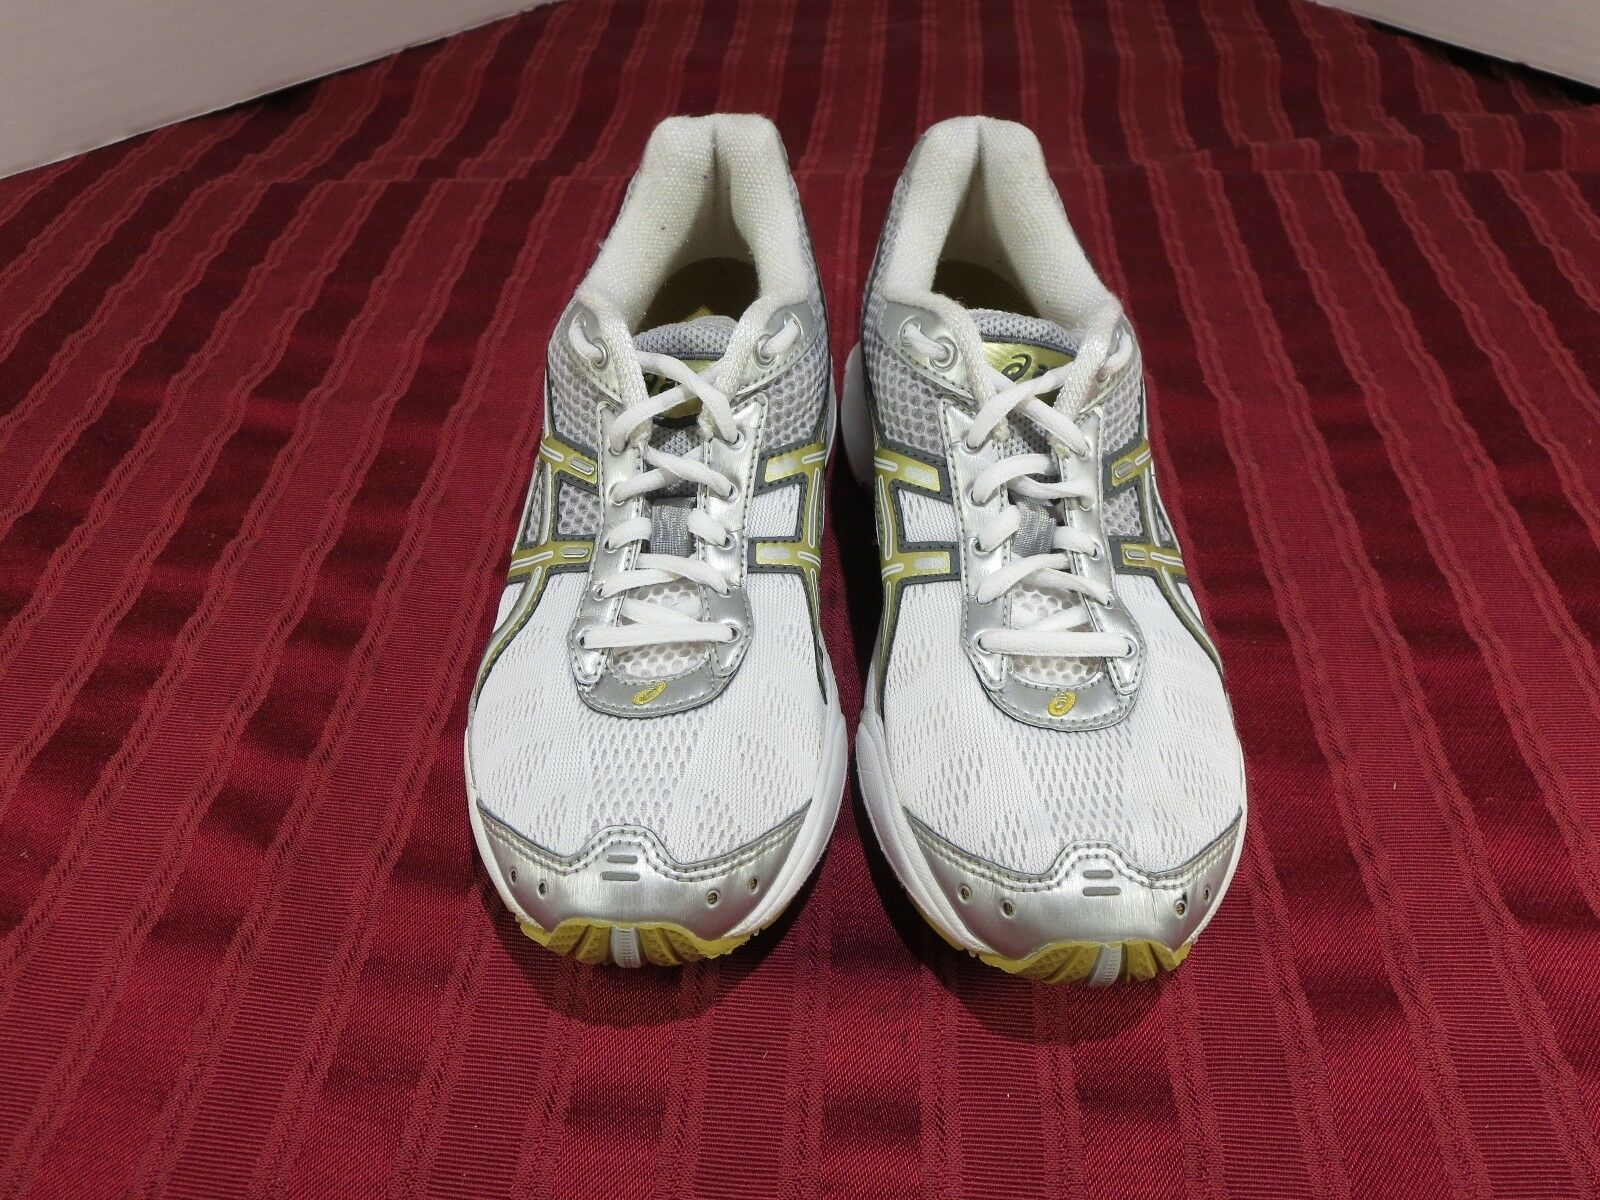 Asics Gel-Landreth Shoes 3 Running Fitness CrossFit Jogging Shoes Gel-Landreth Women Size 7.5 9fa5b4